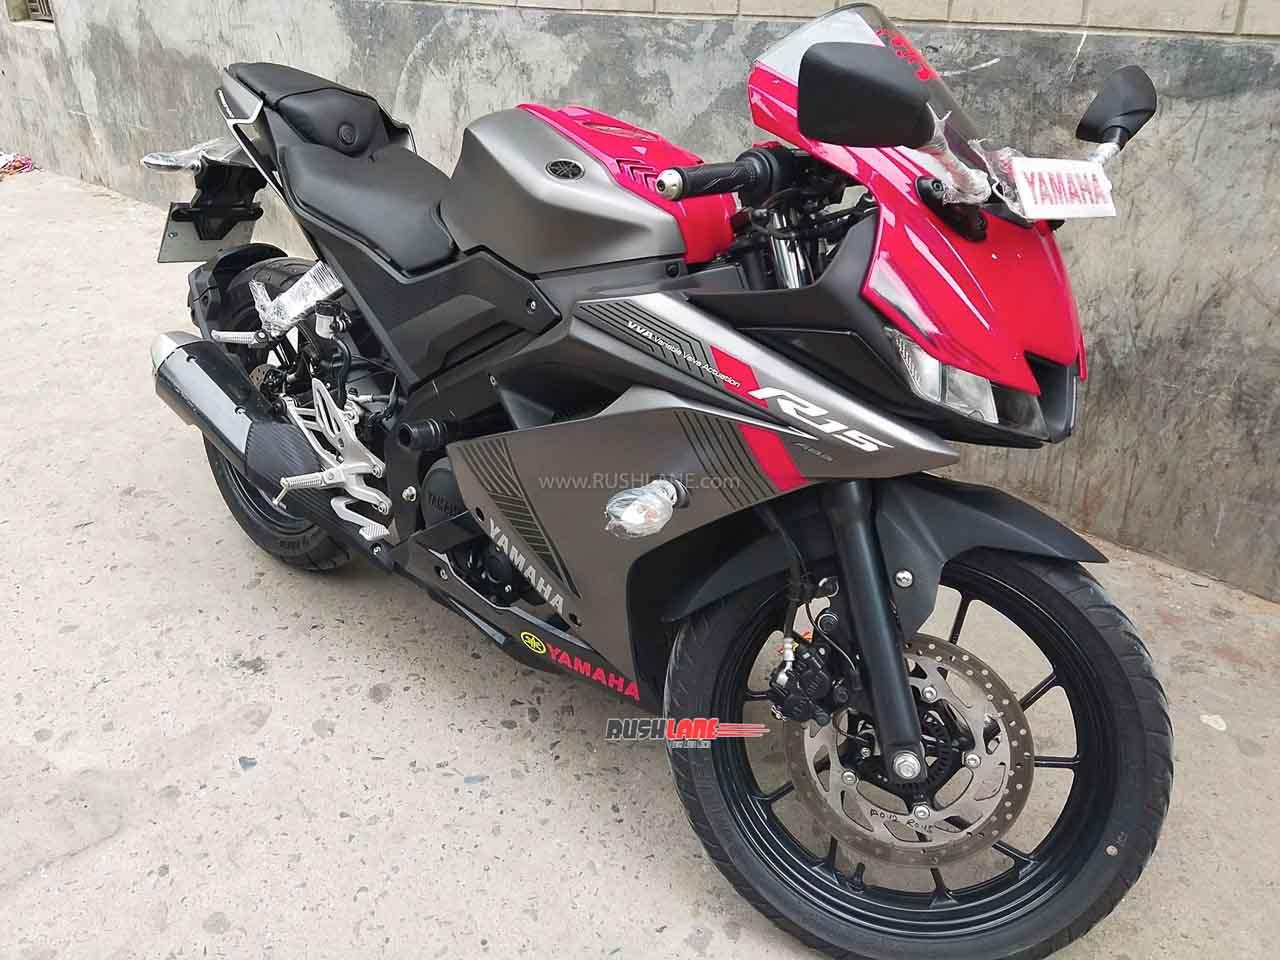 Yamaha R15 prices